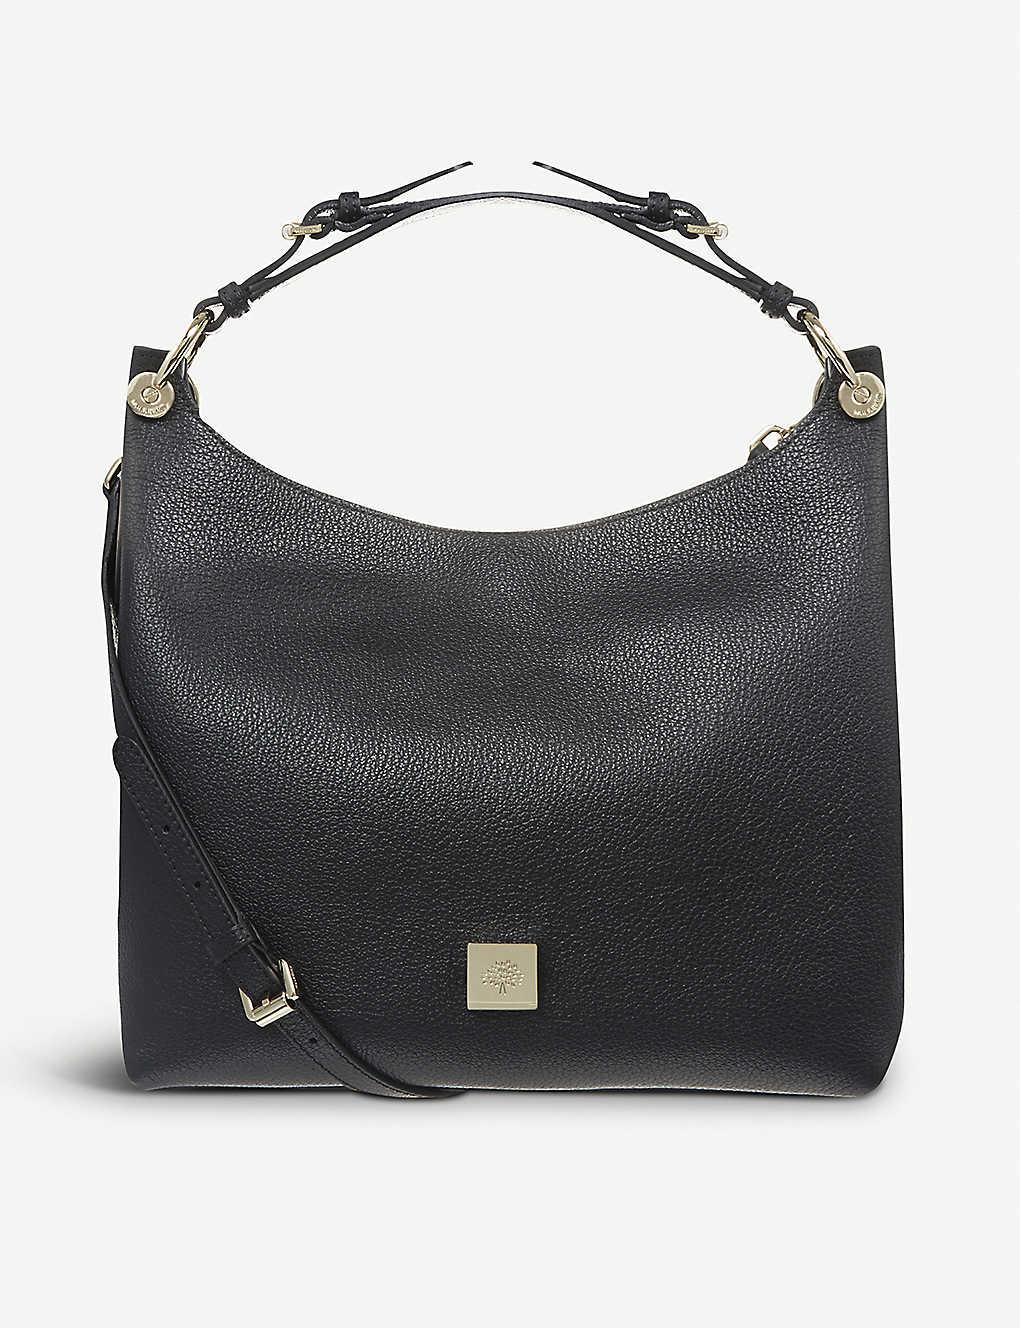 MULBERRY - Freya small leather hobo bag   Selfridges.com 59905eb450